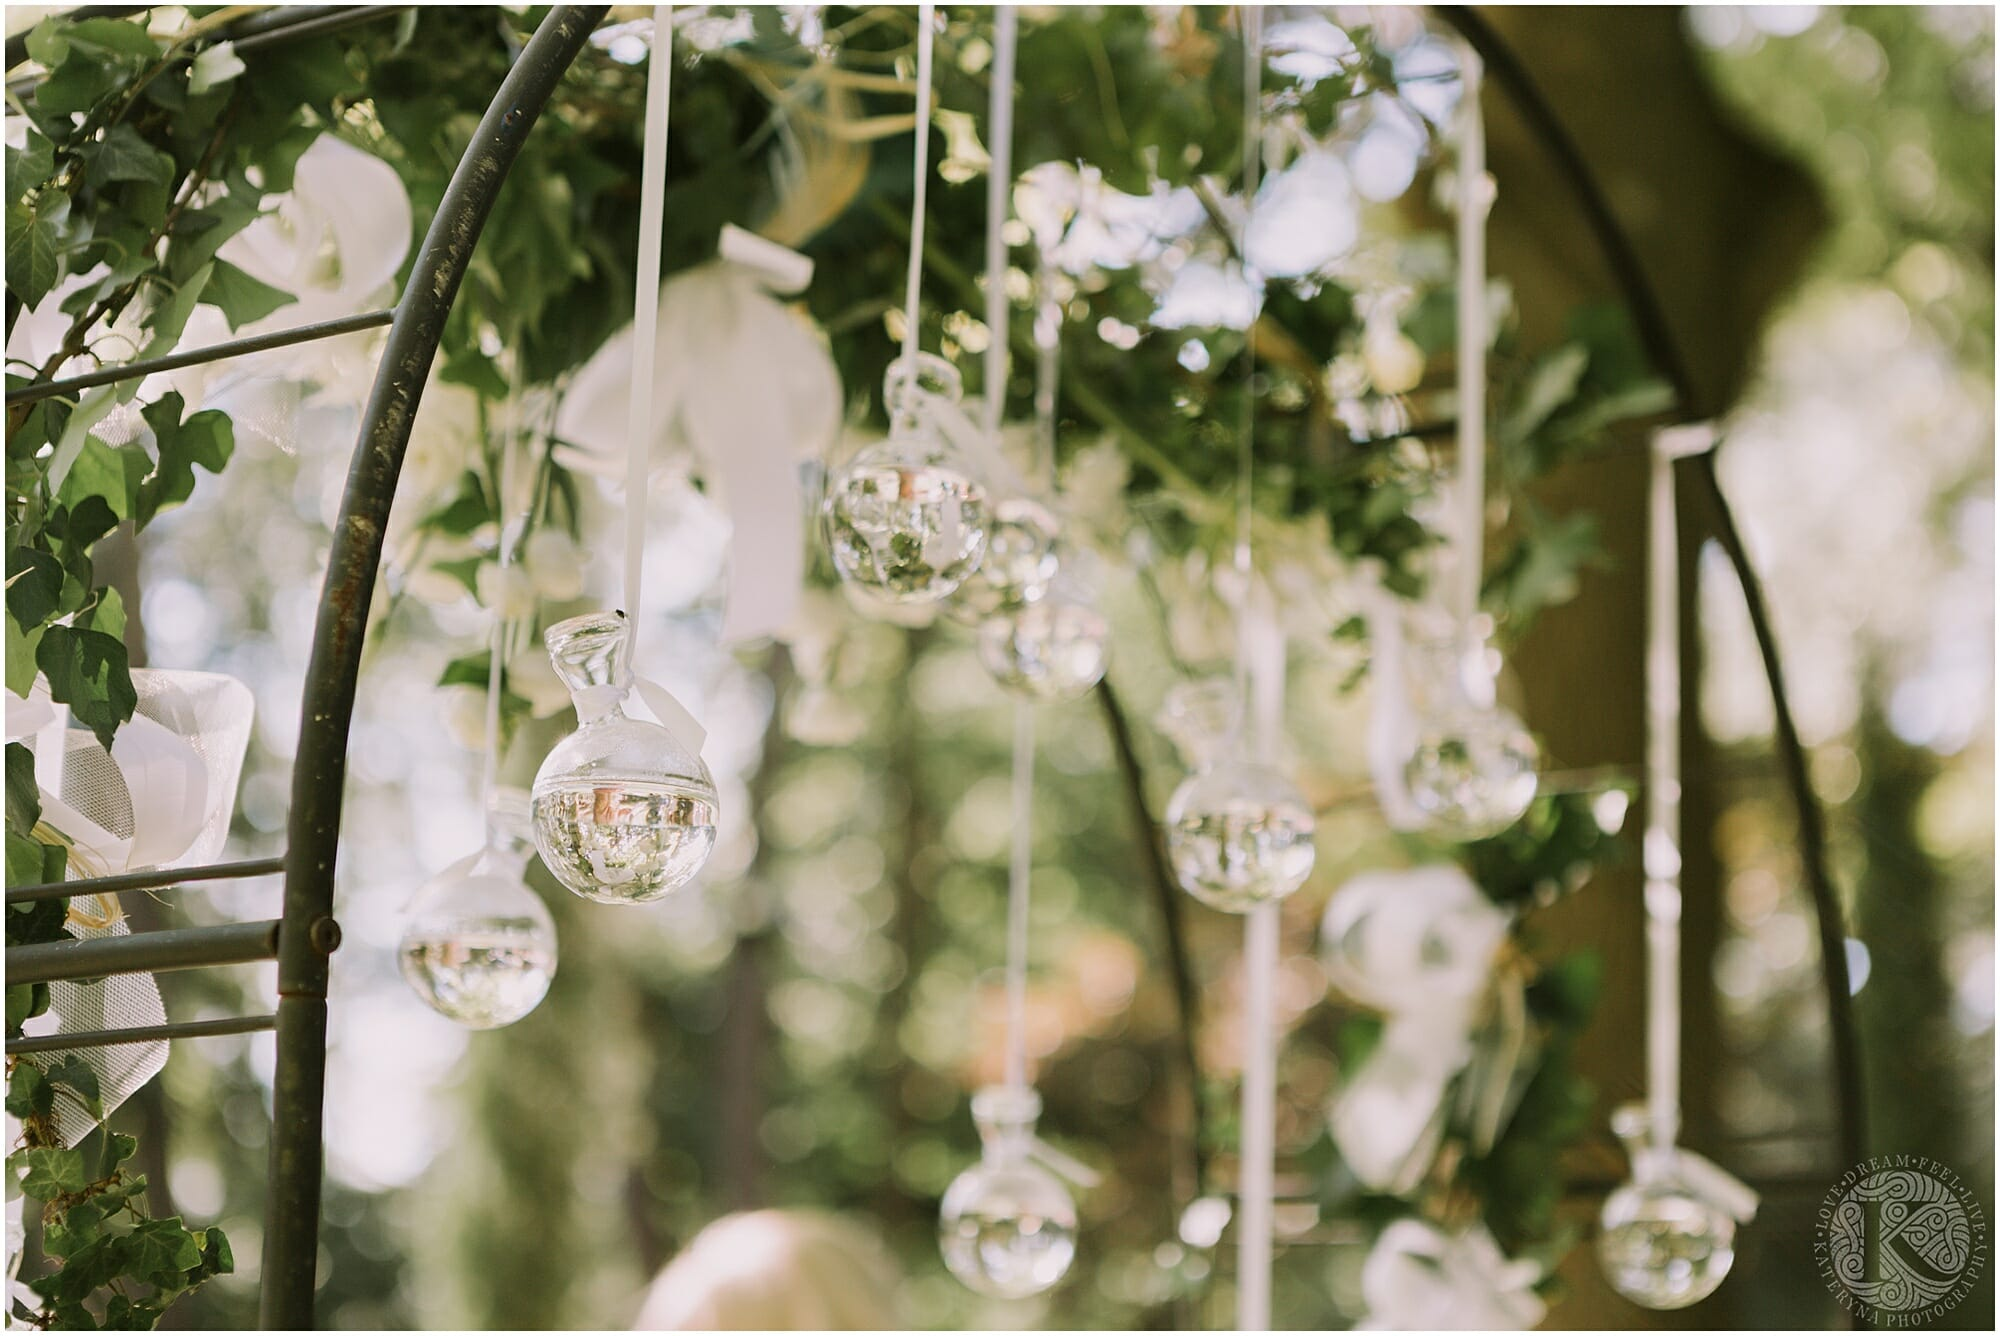 Kateryna-photos-photographe-mariage-chateau-des-3-fontaines-provence-avignon-vaucluse-sud_0045.jpg